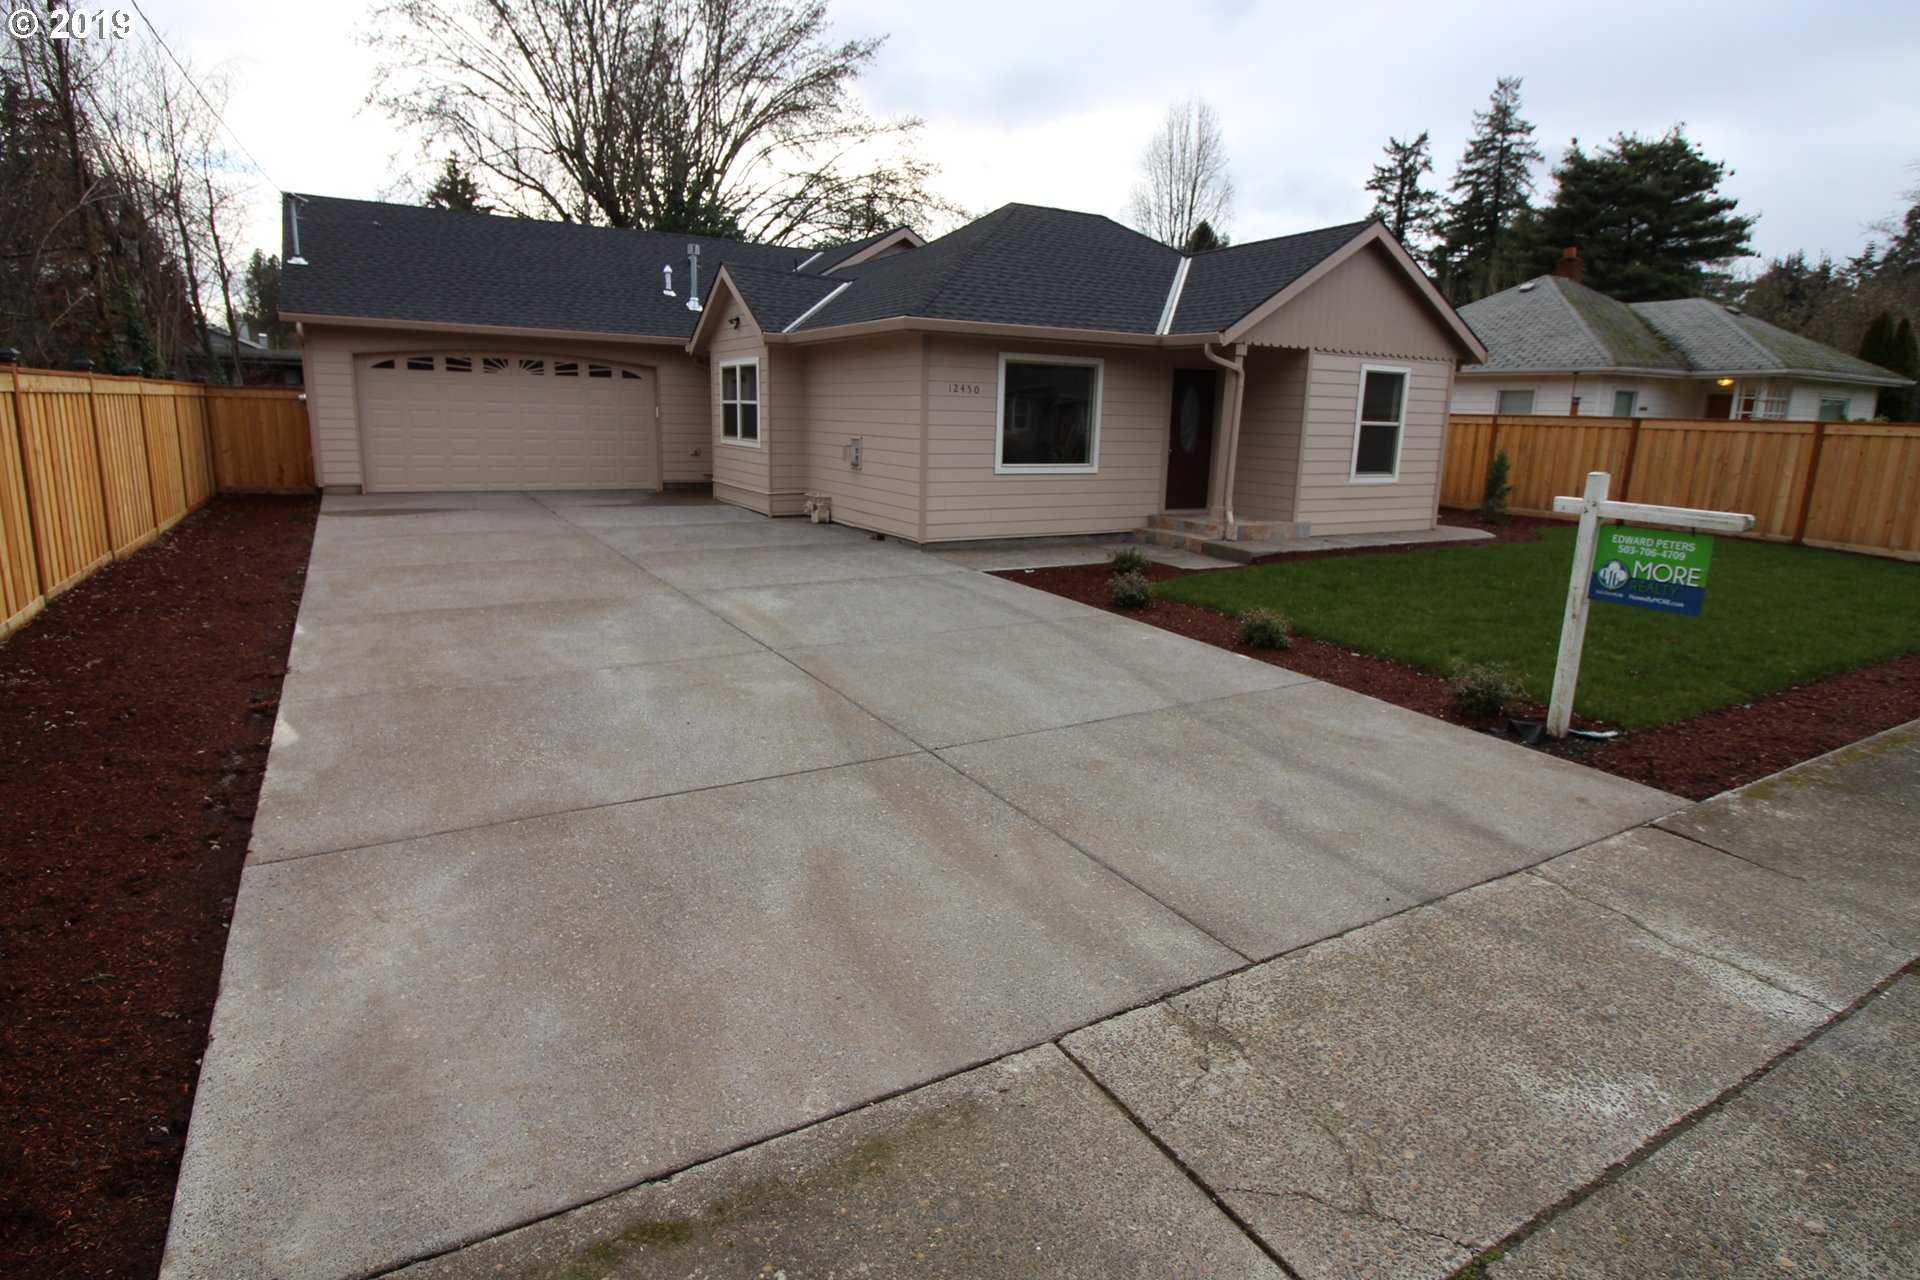 $499,900 - 3Br/2Ba -  for Sale in Beaverton